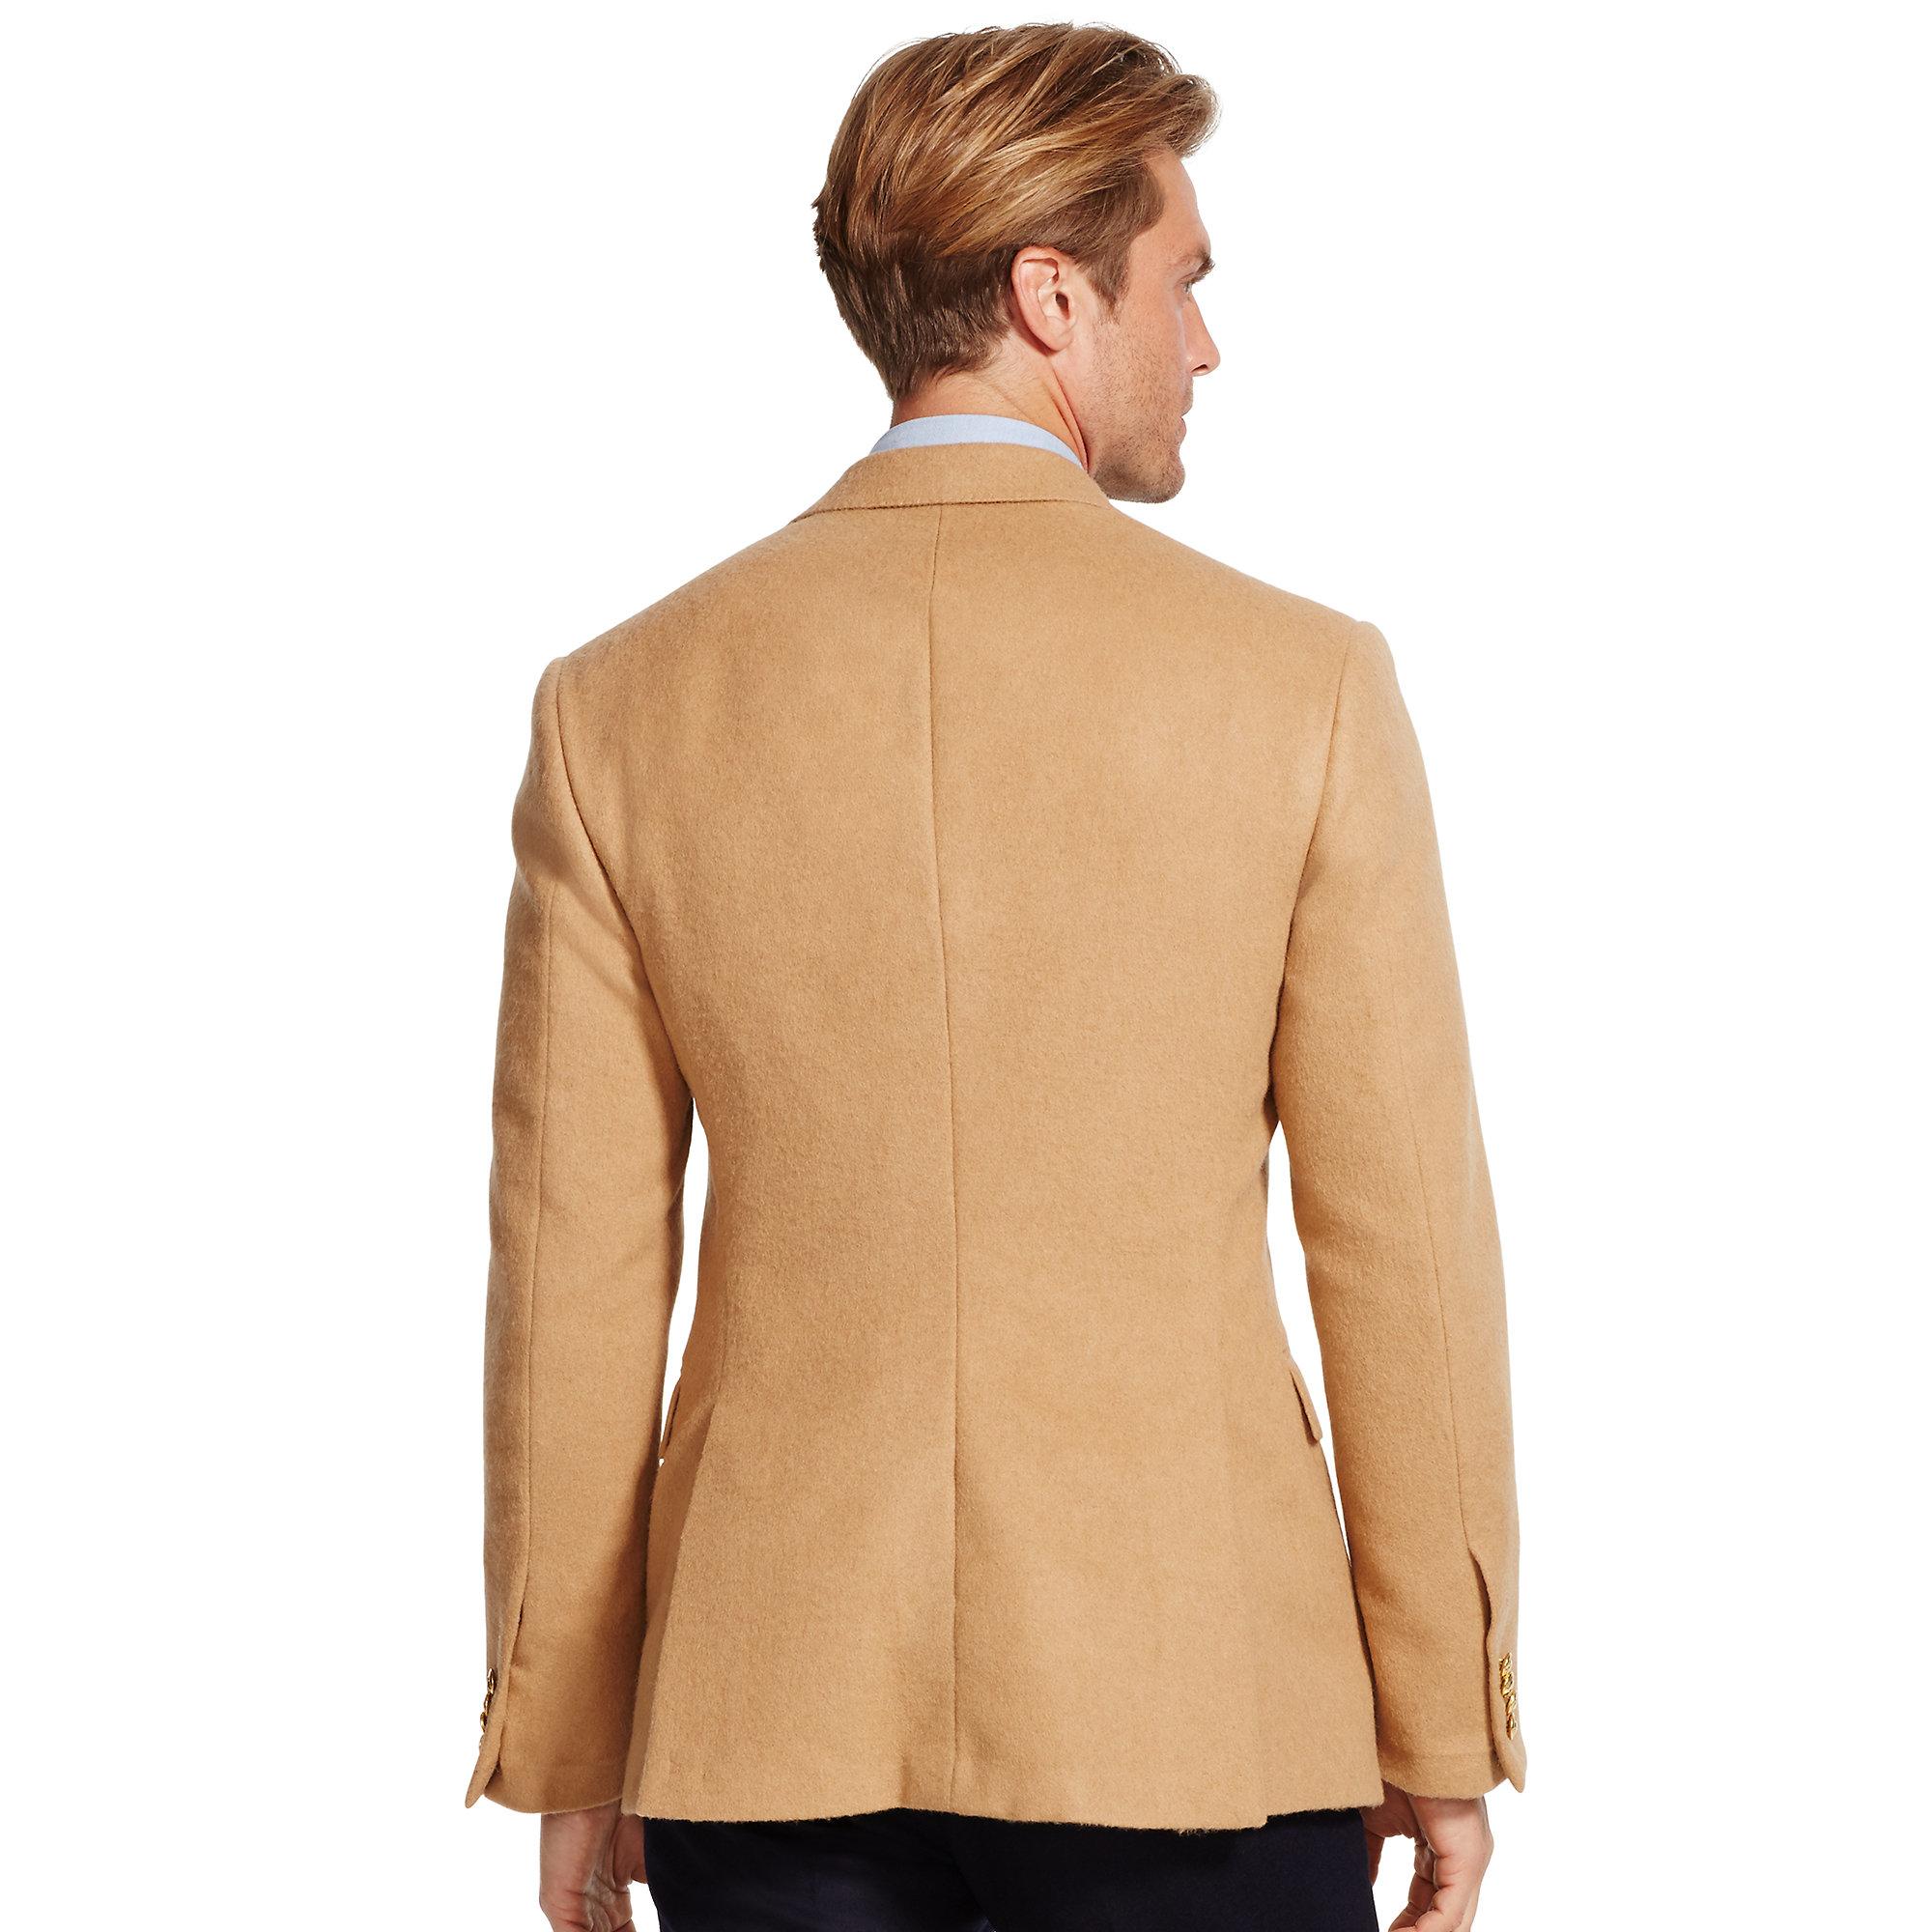 3c3503c43c50b Lyst - Polo Ralph Lauren Polo I Camel Hair Sport Coat in Natural for Men